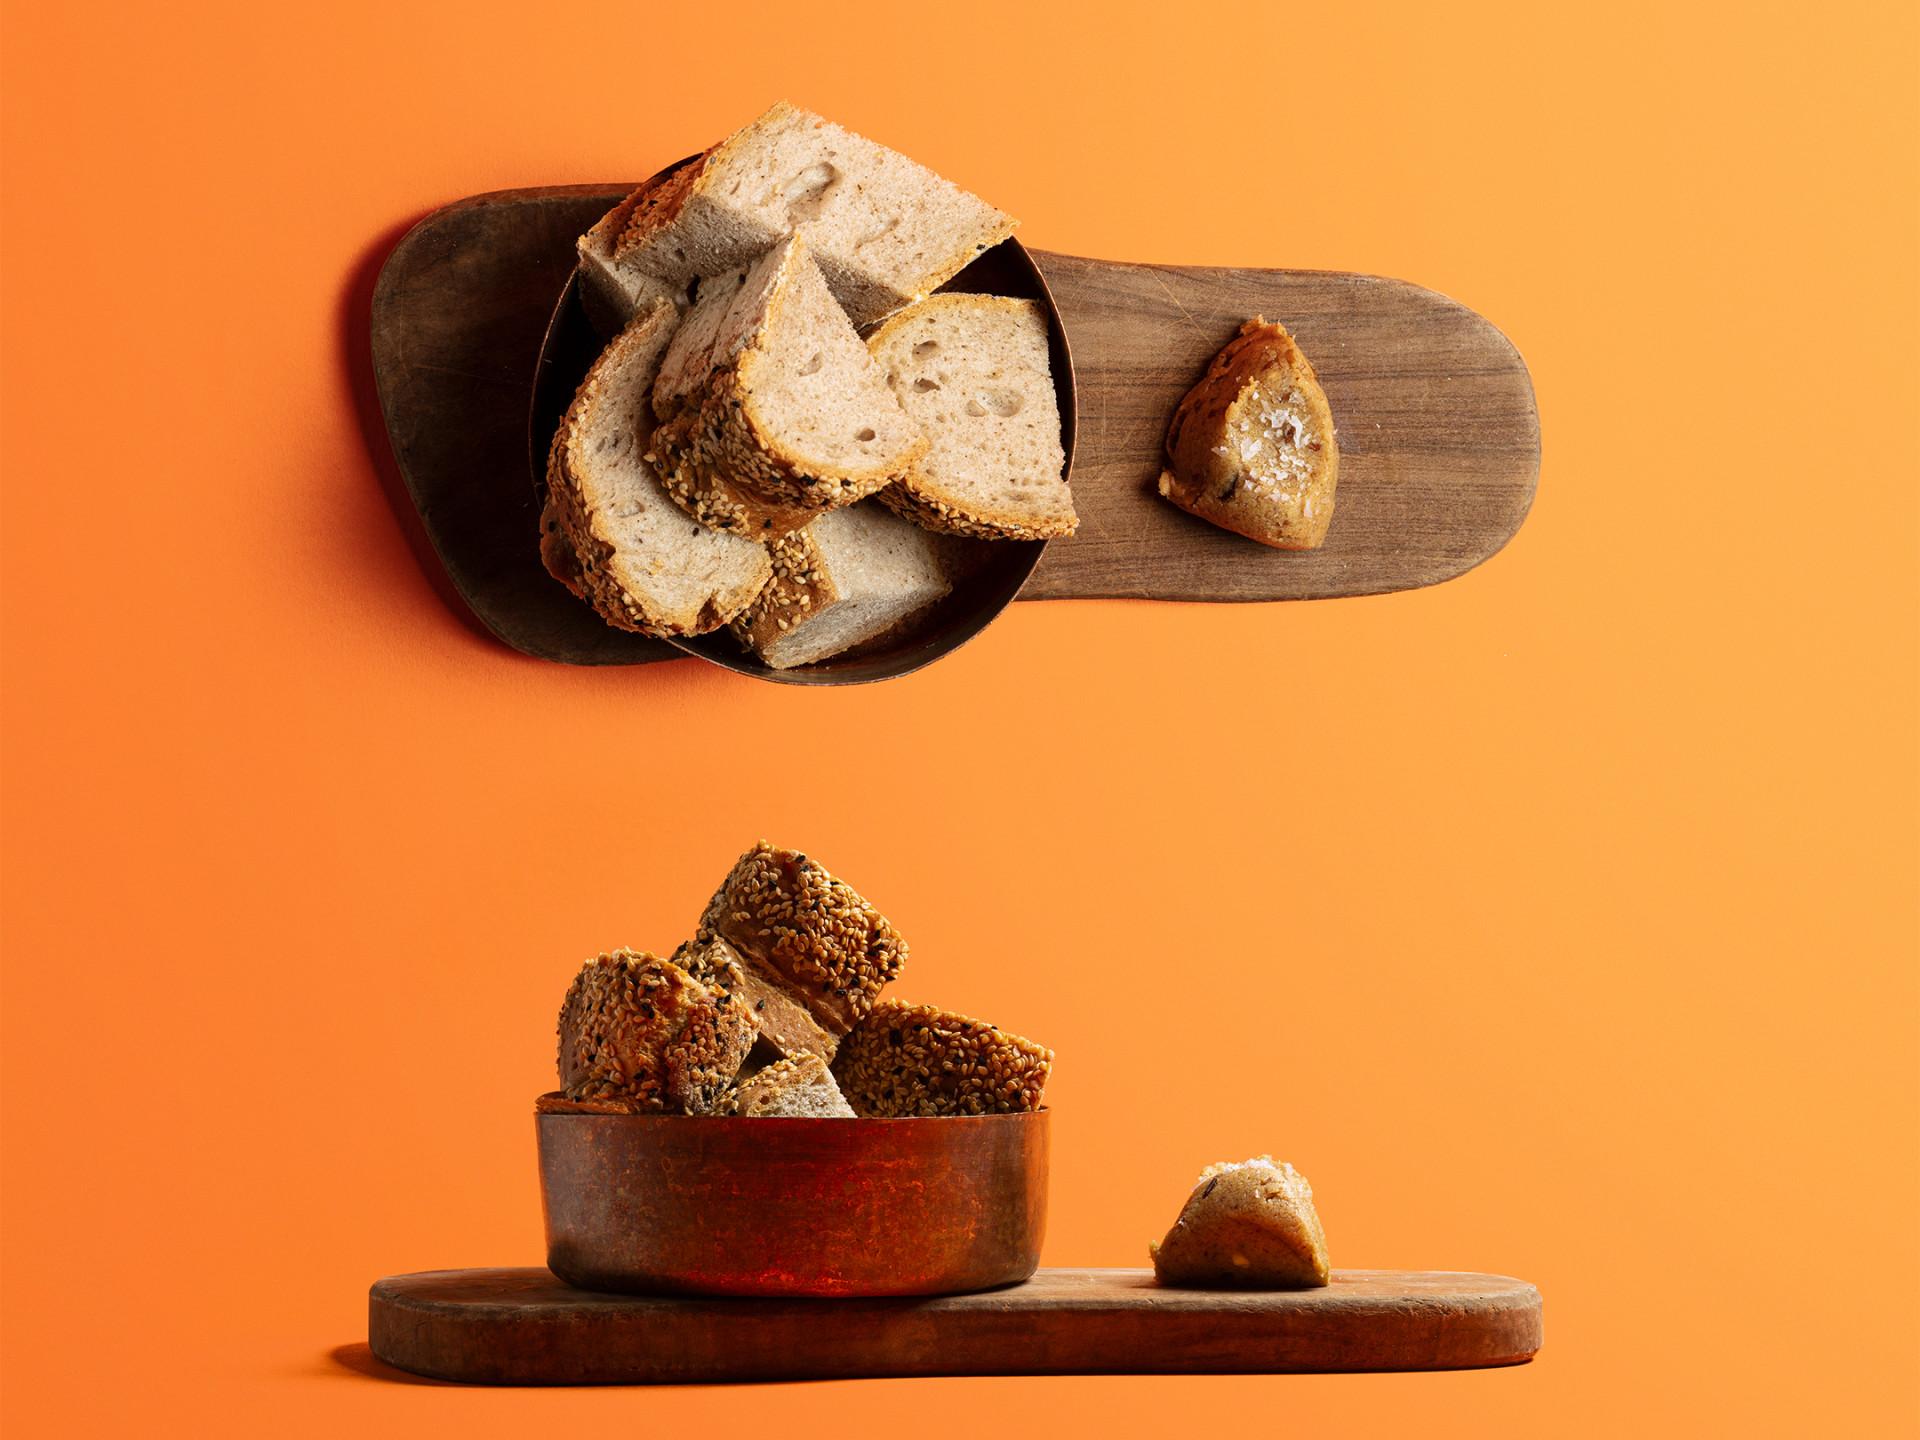 Selin Kiazim's spiced bread and medjool date butter